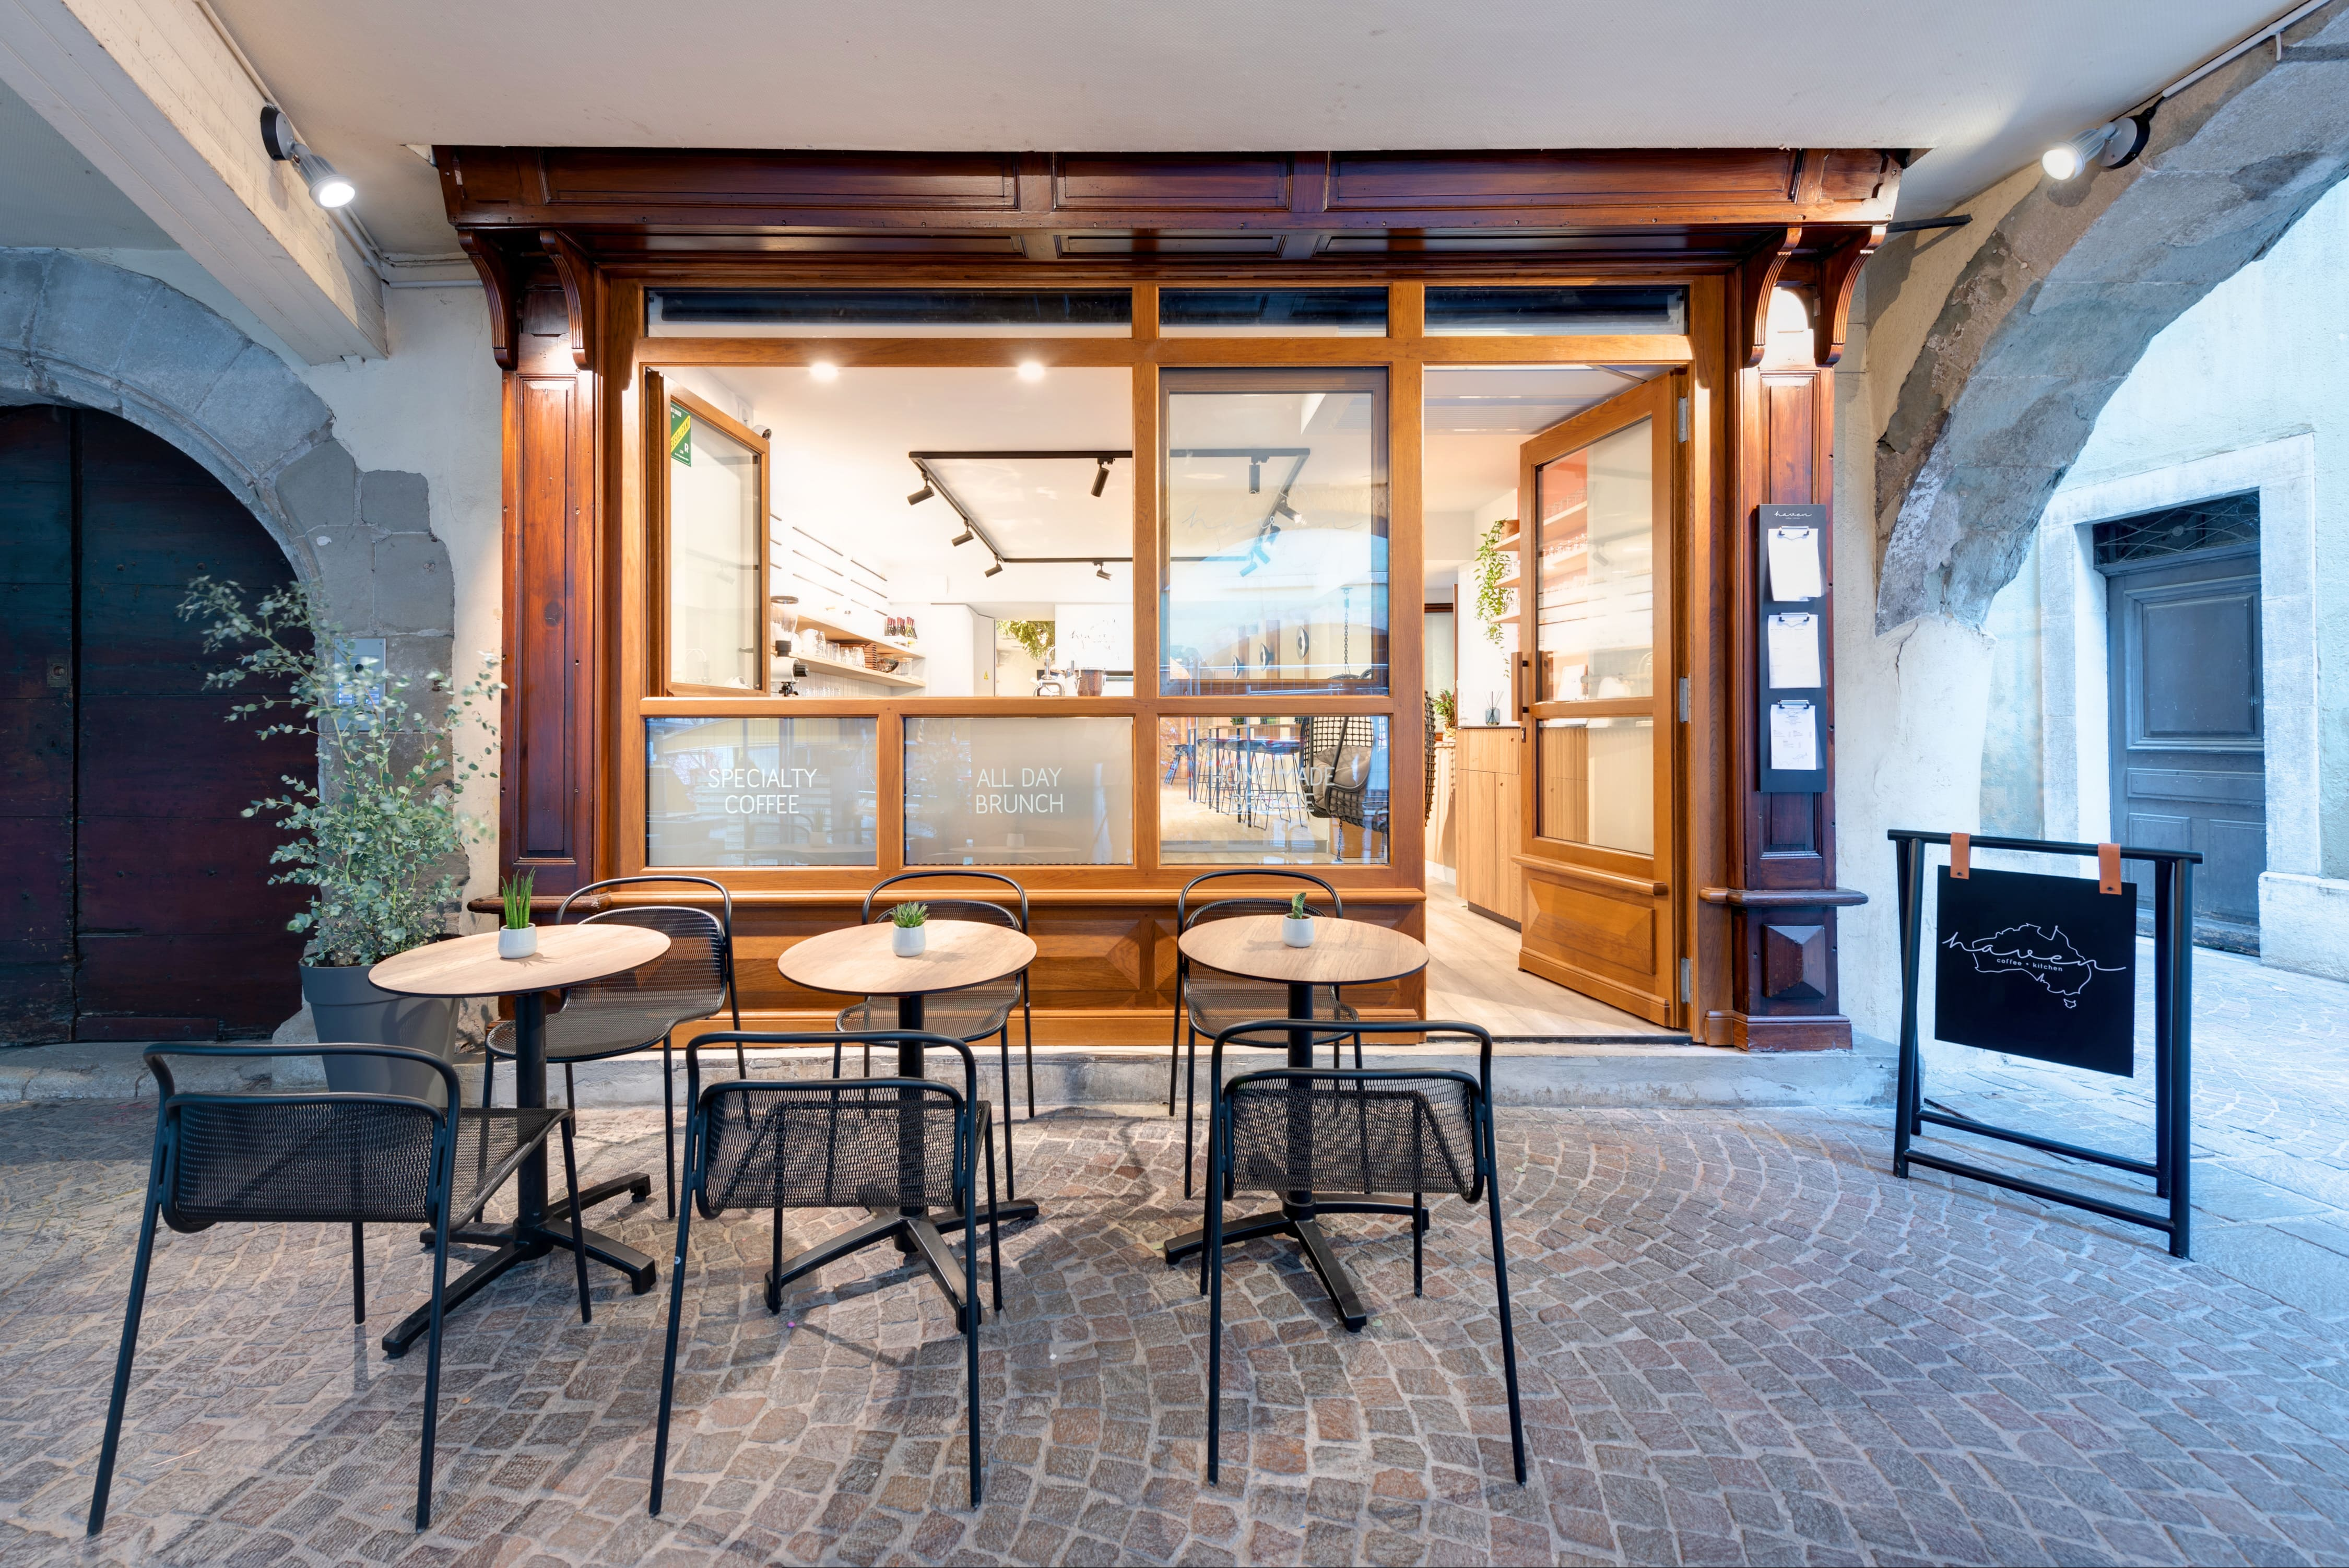 Agencement interieur design métallique ROBI restaurant Haven Annecy 74 agencement en metal 8